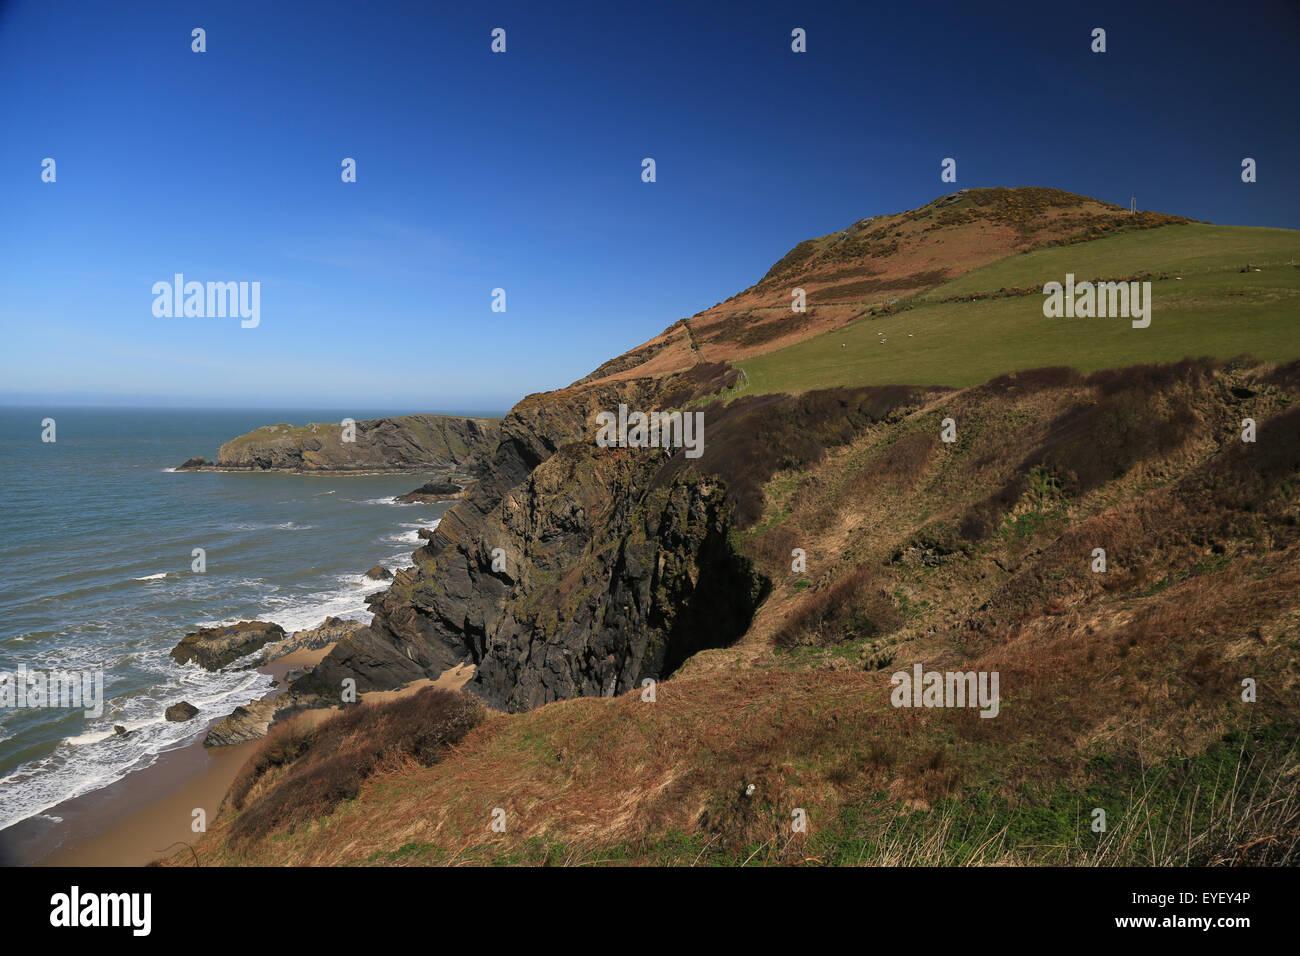 Cardigan Bay, Wales, Coast Path View - Stock Image